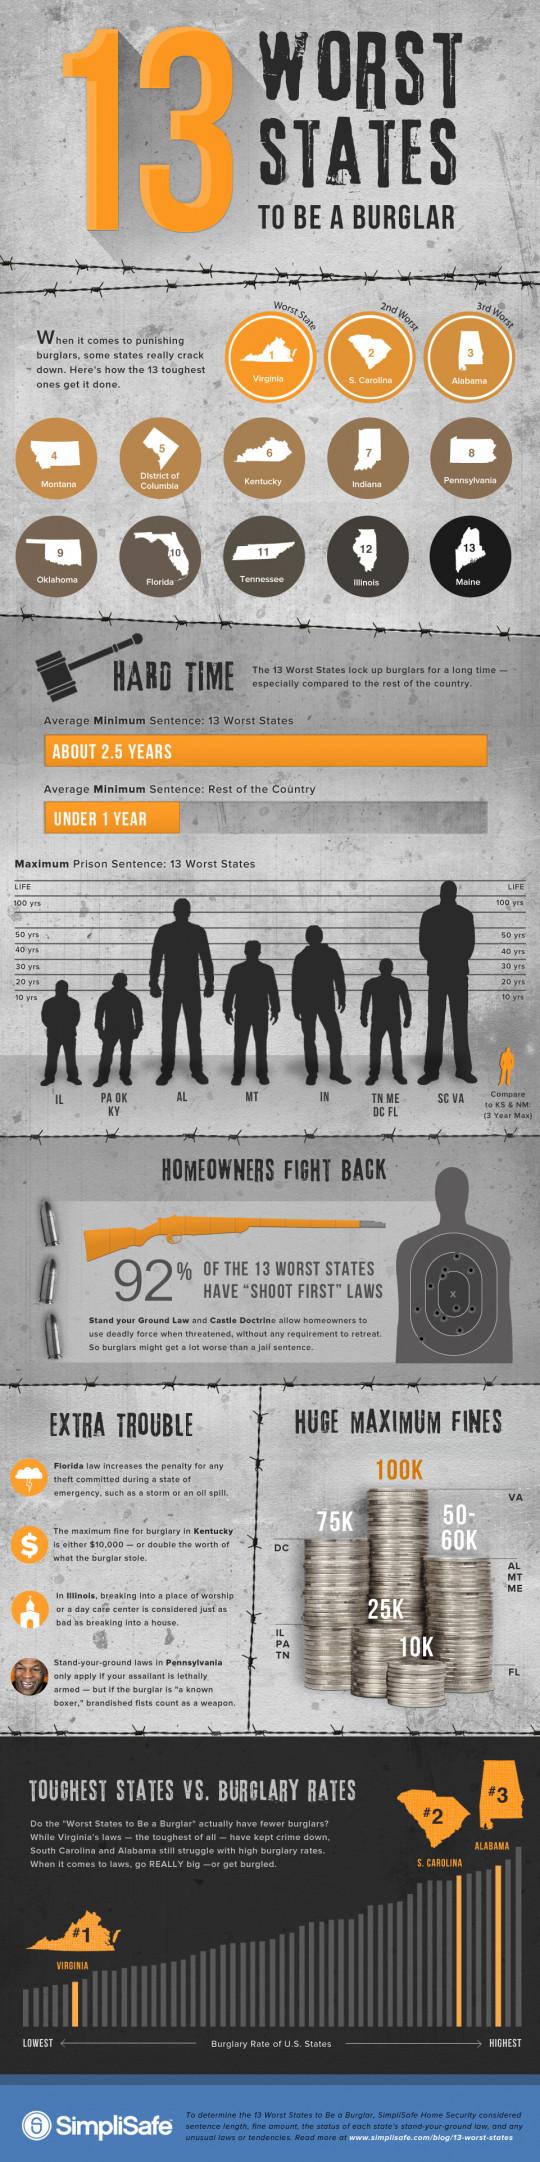 13 Worst States To Be A Burglar